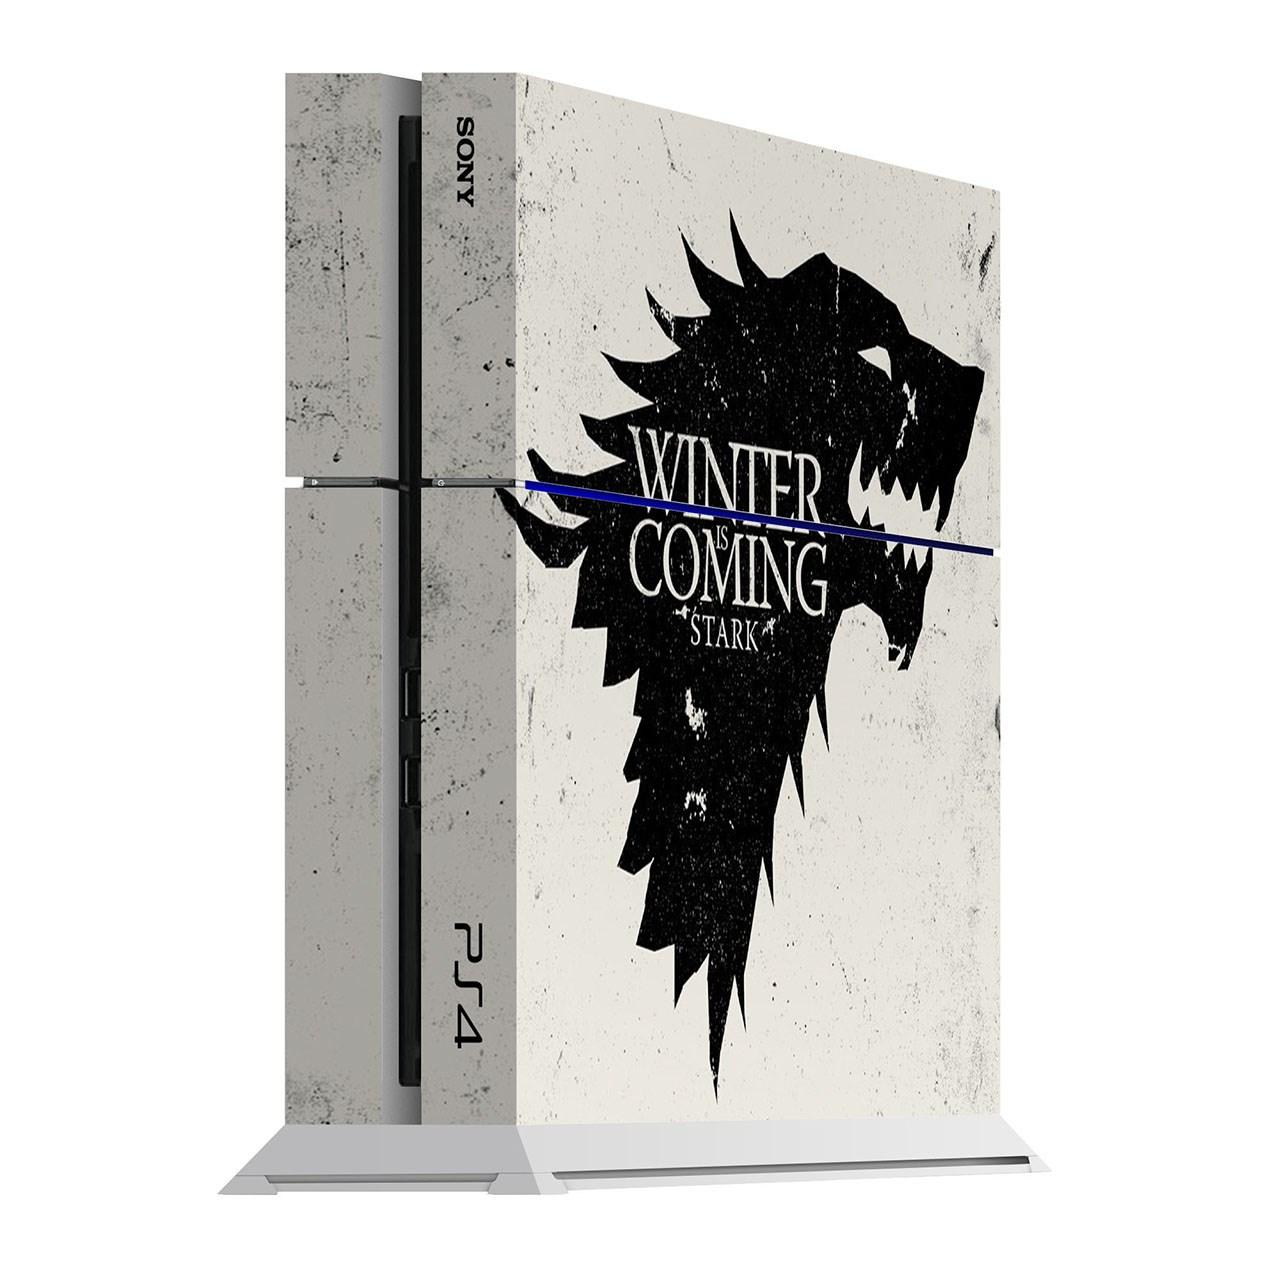 برچسب عمودی پلی استیشن 4 ونسونی طرح Winter is Coming White